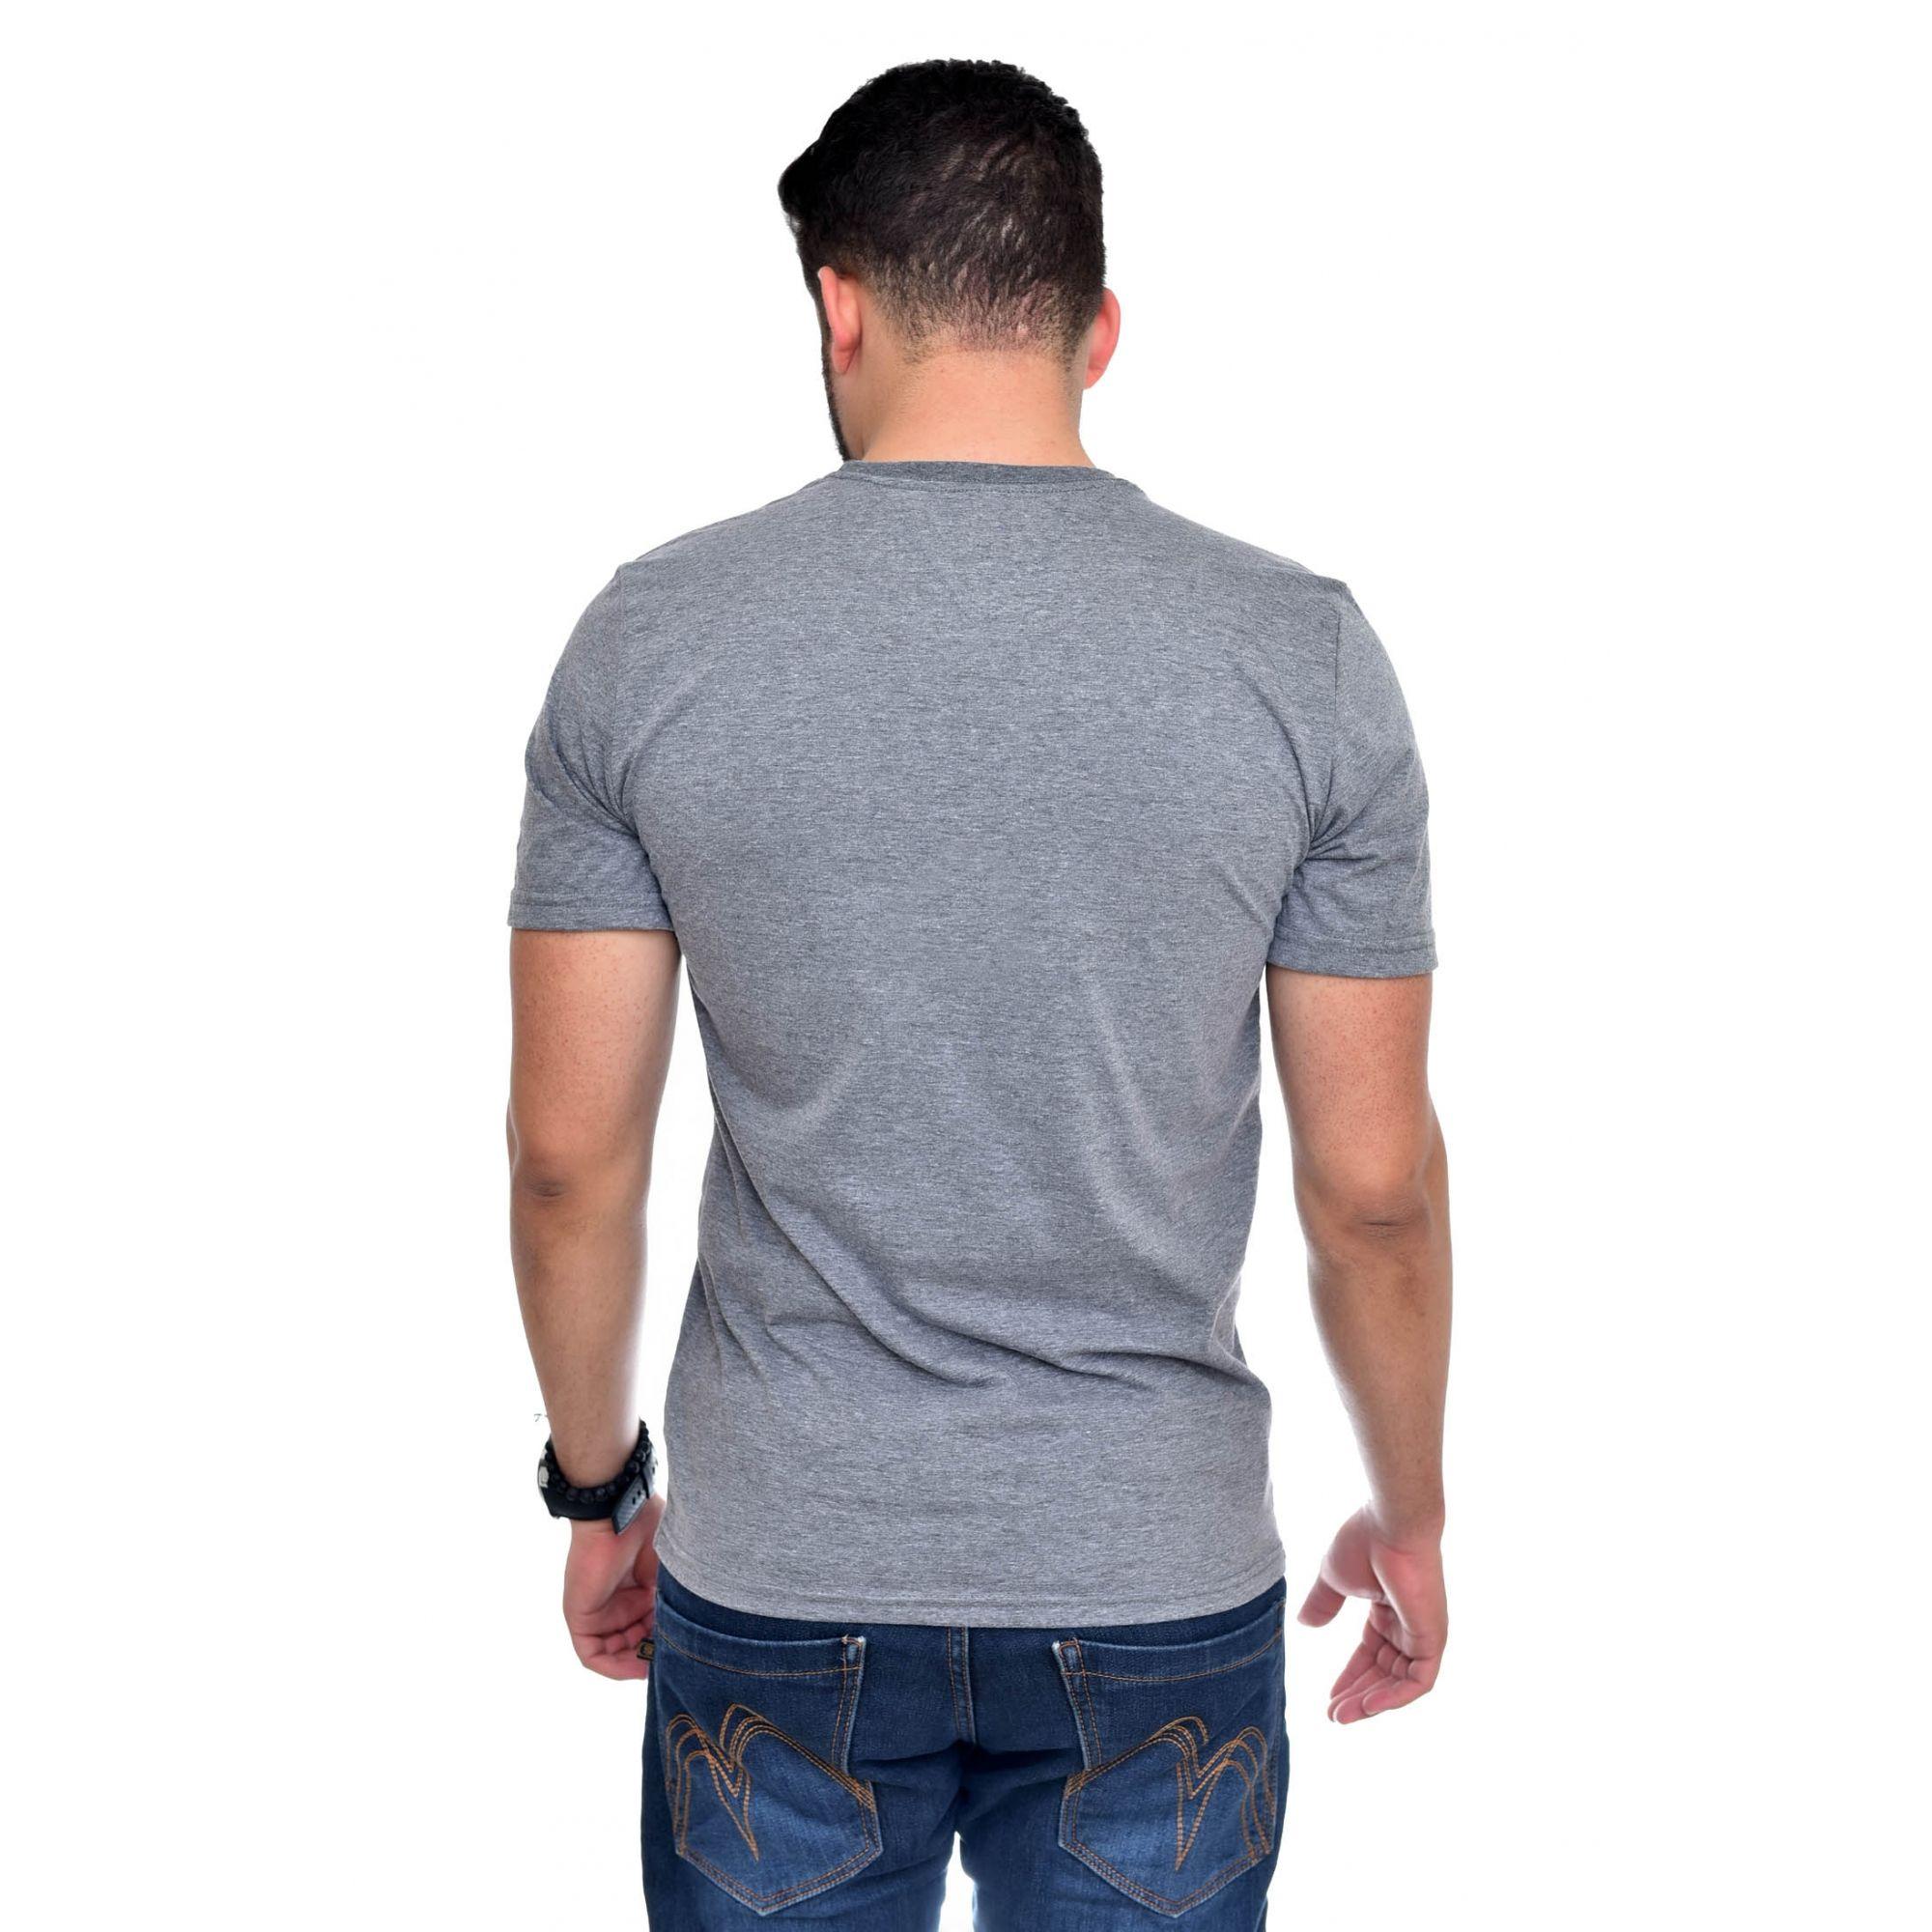 Camiseta TH Big T Mescla Escuro  - Ca Brasileira